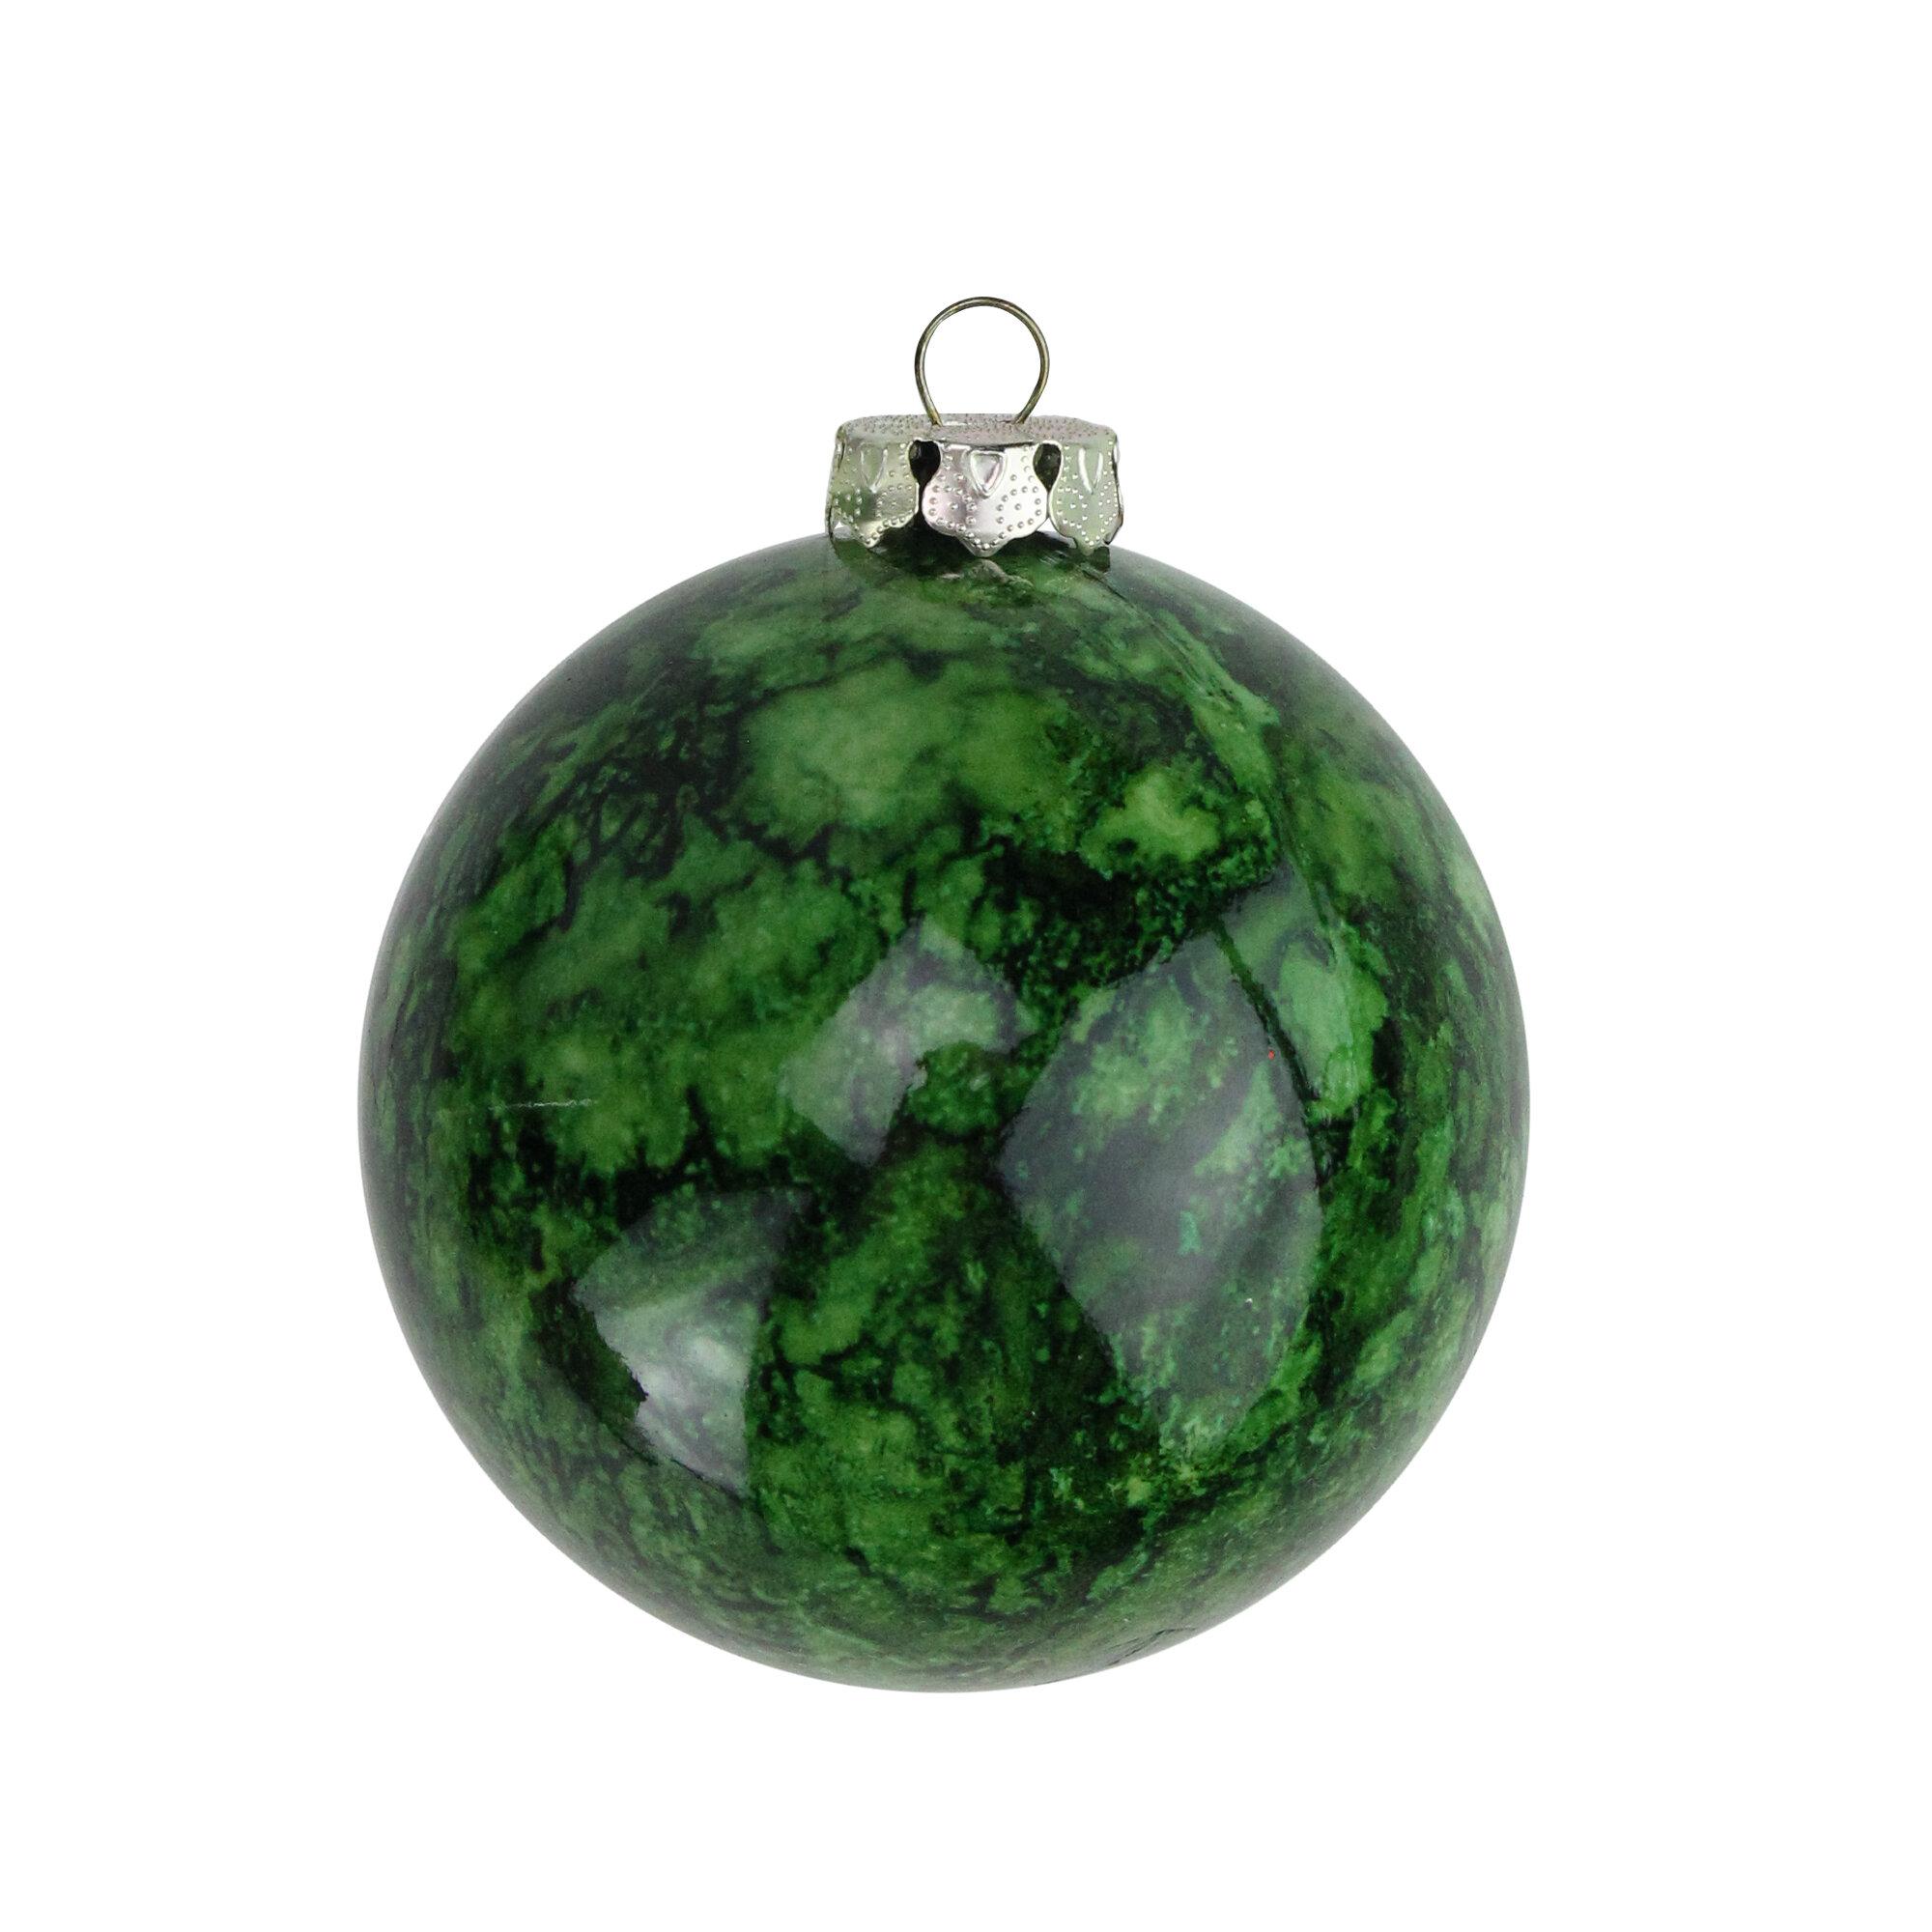 Northlight Marbled Shatterproof Christmas Ball Ornament Reviews Wayfair